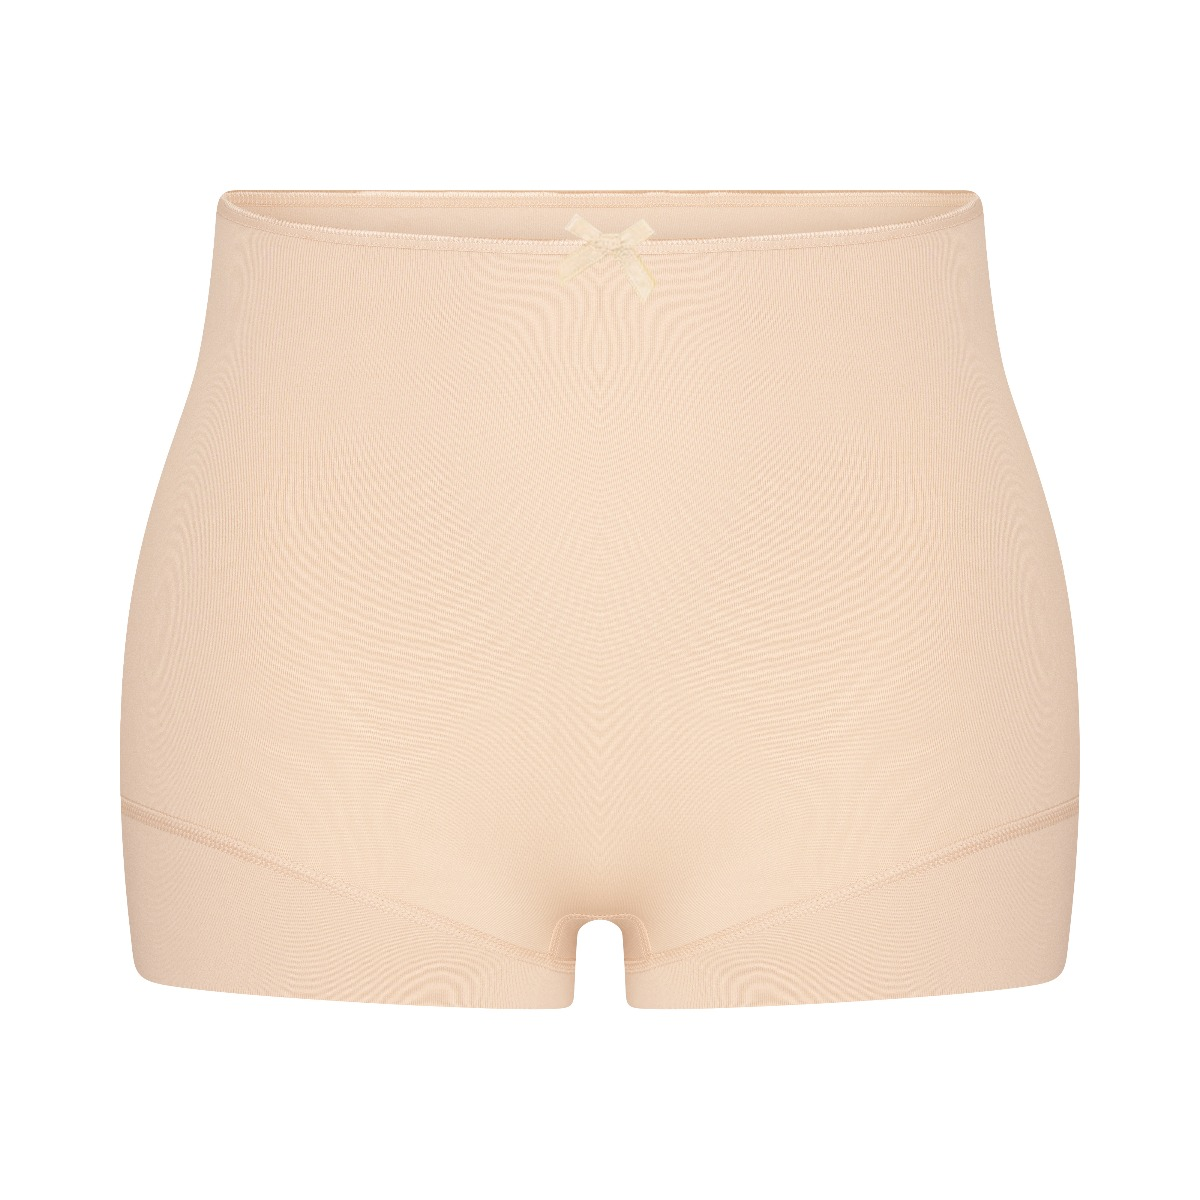 RJ Pure Color Dames Short Extra Hoog Nude XL